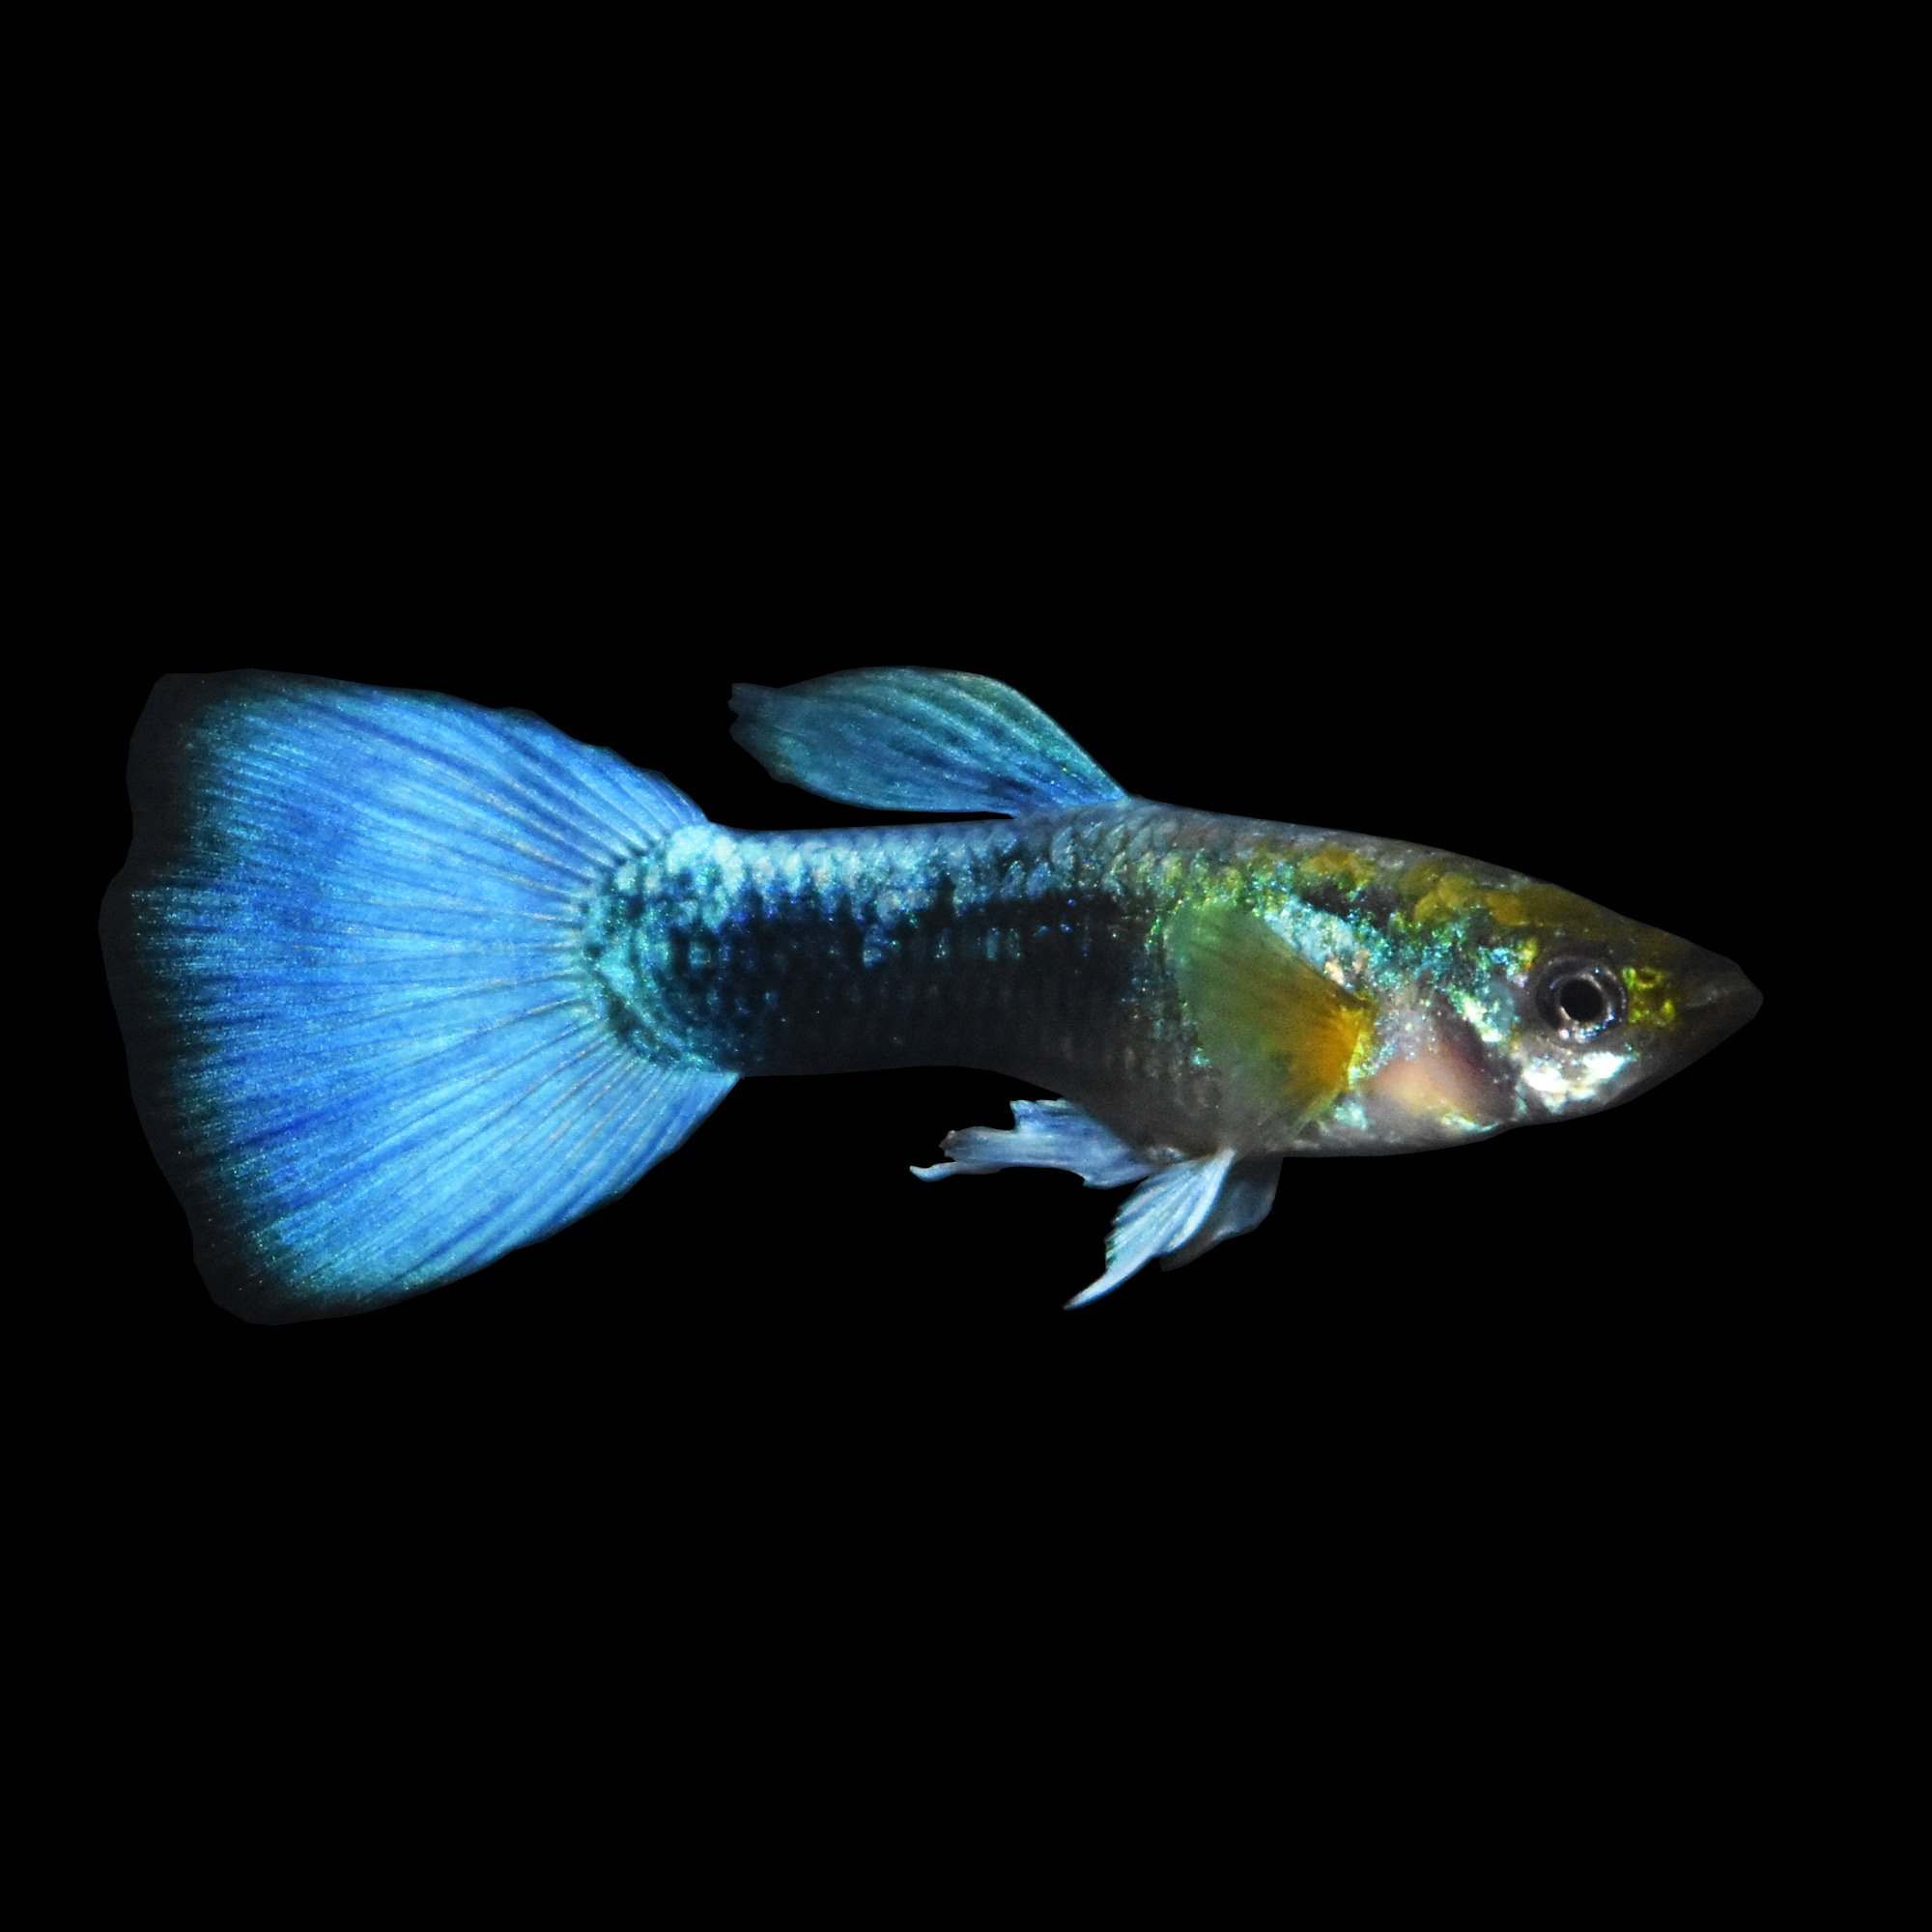 Blue neon guppy petco for Petco fish food